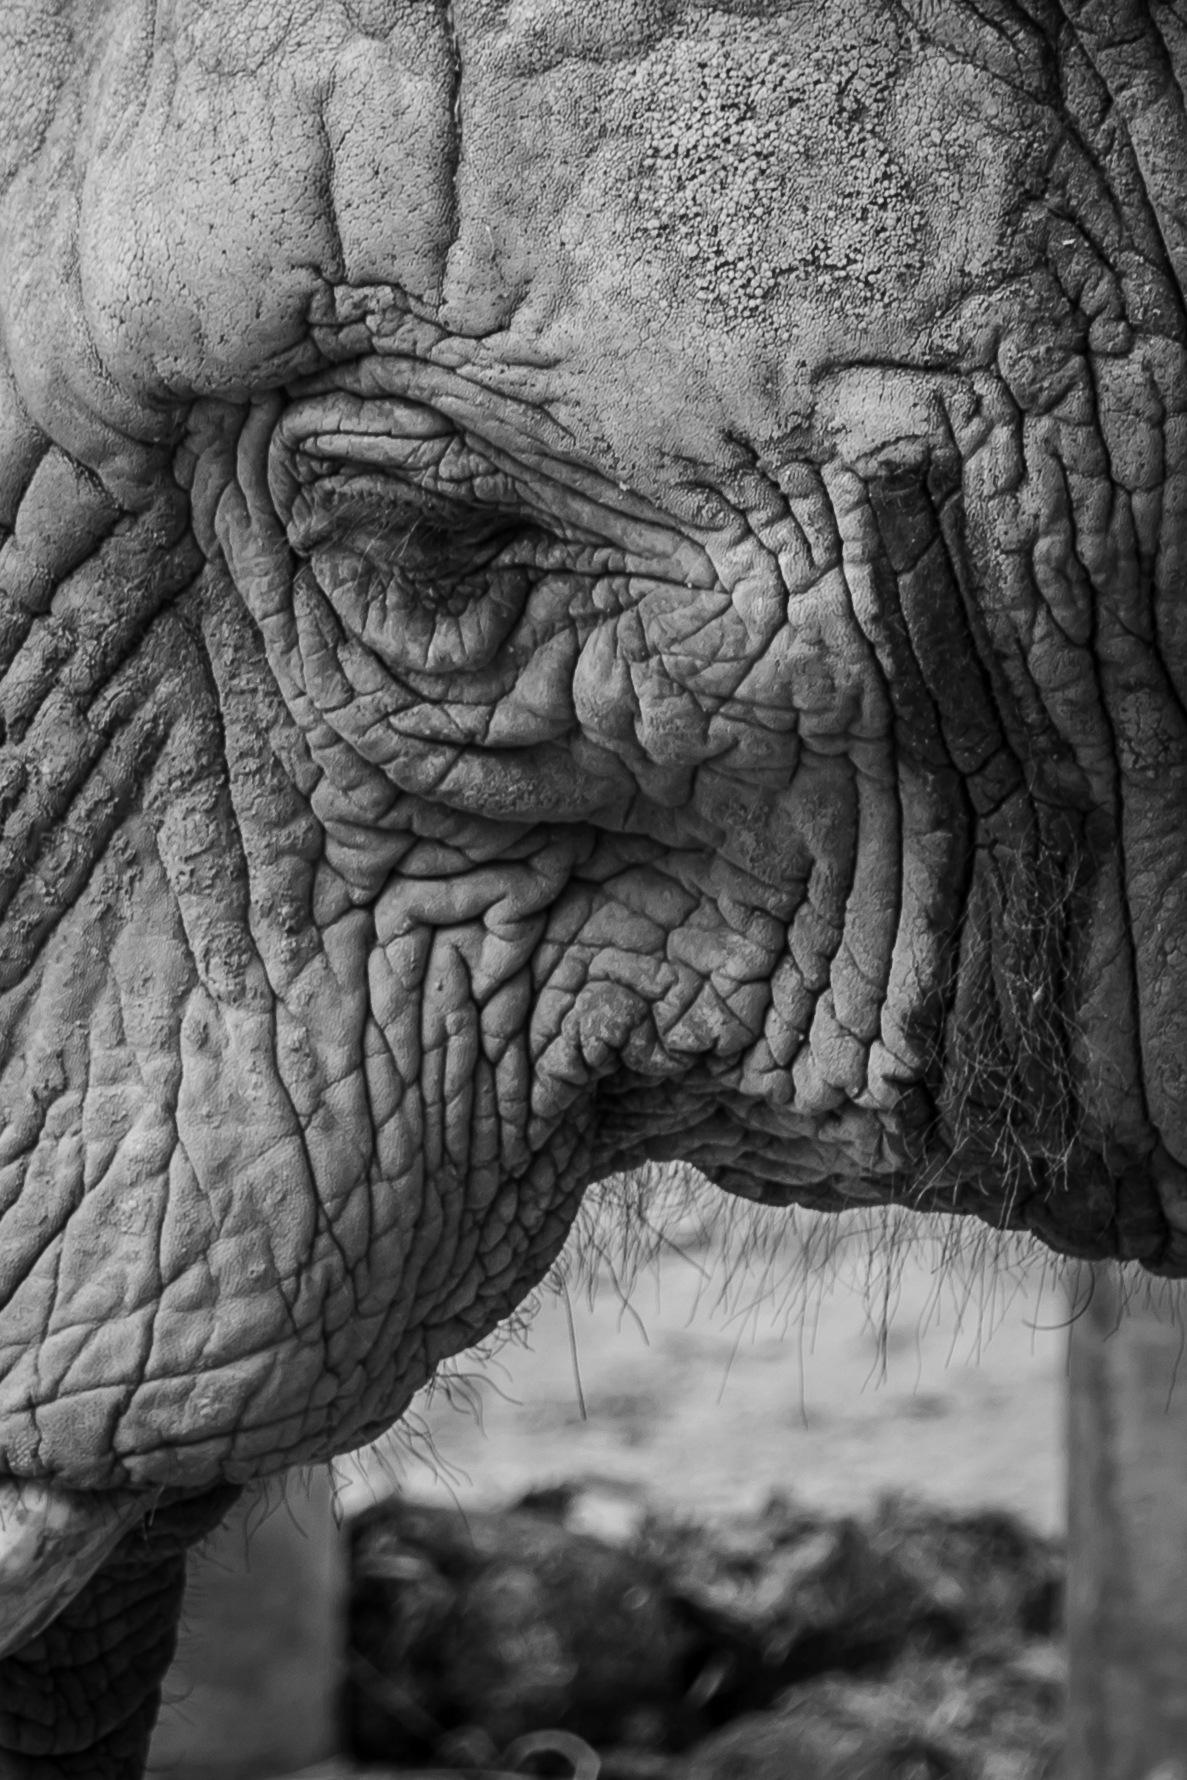 elephant detail by Laurent Adien